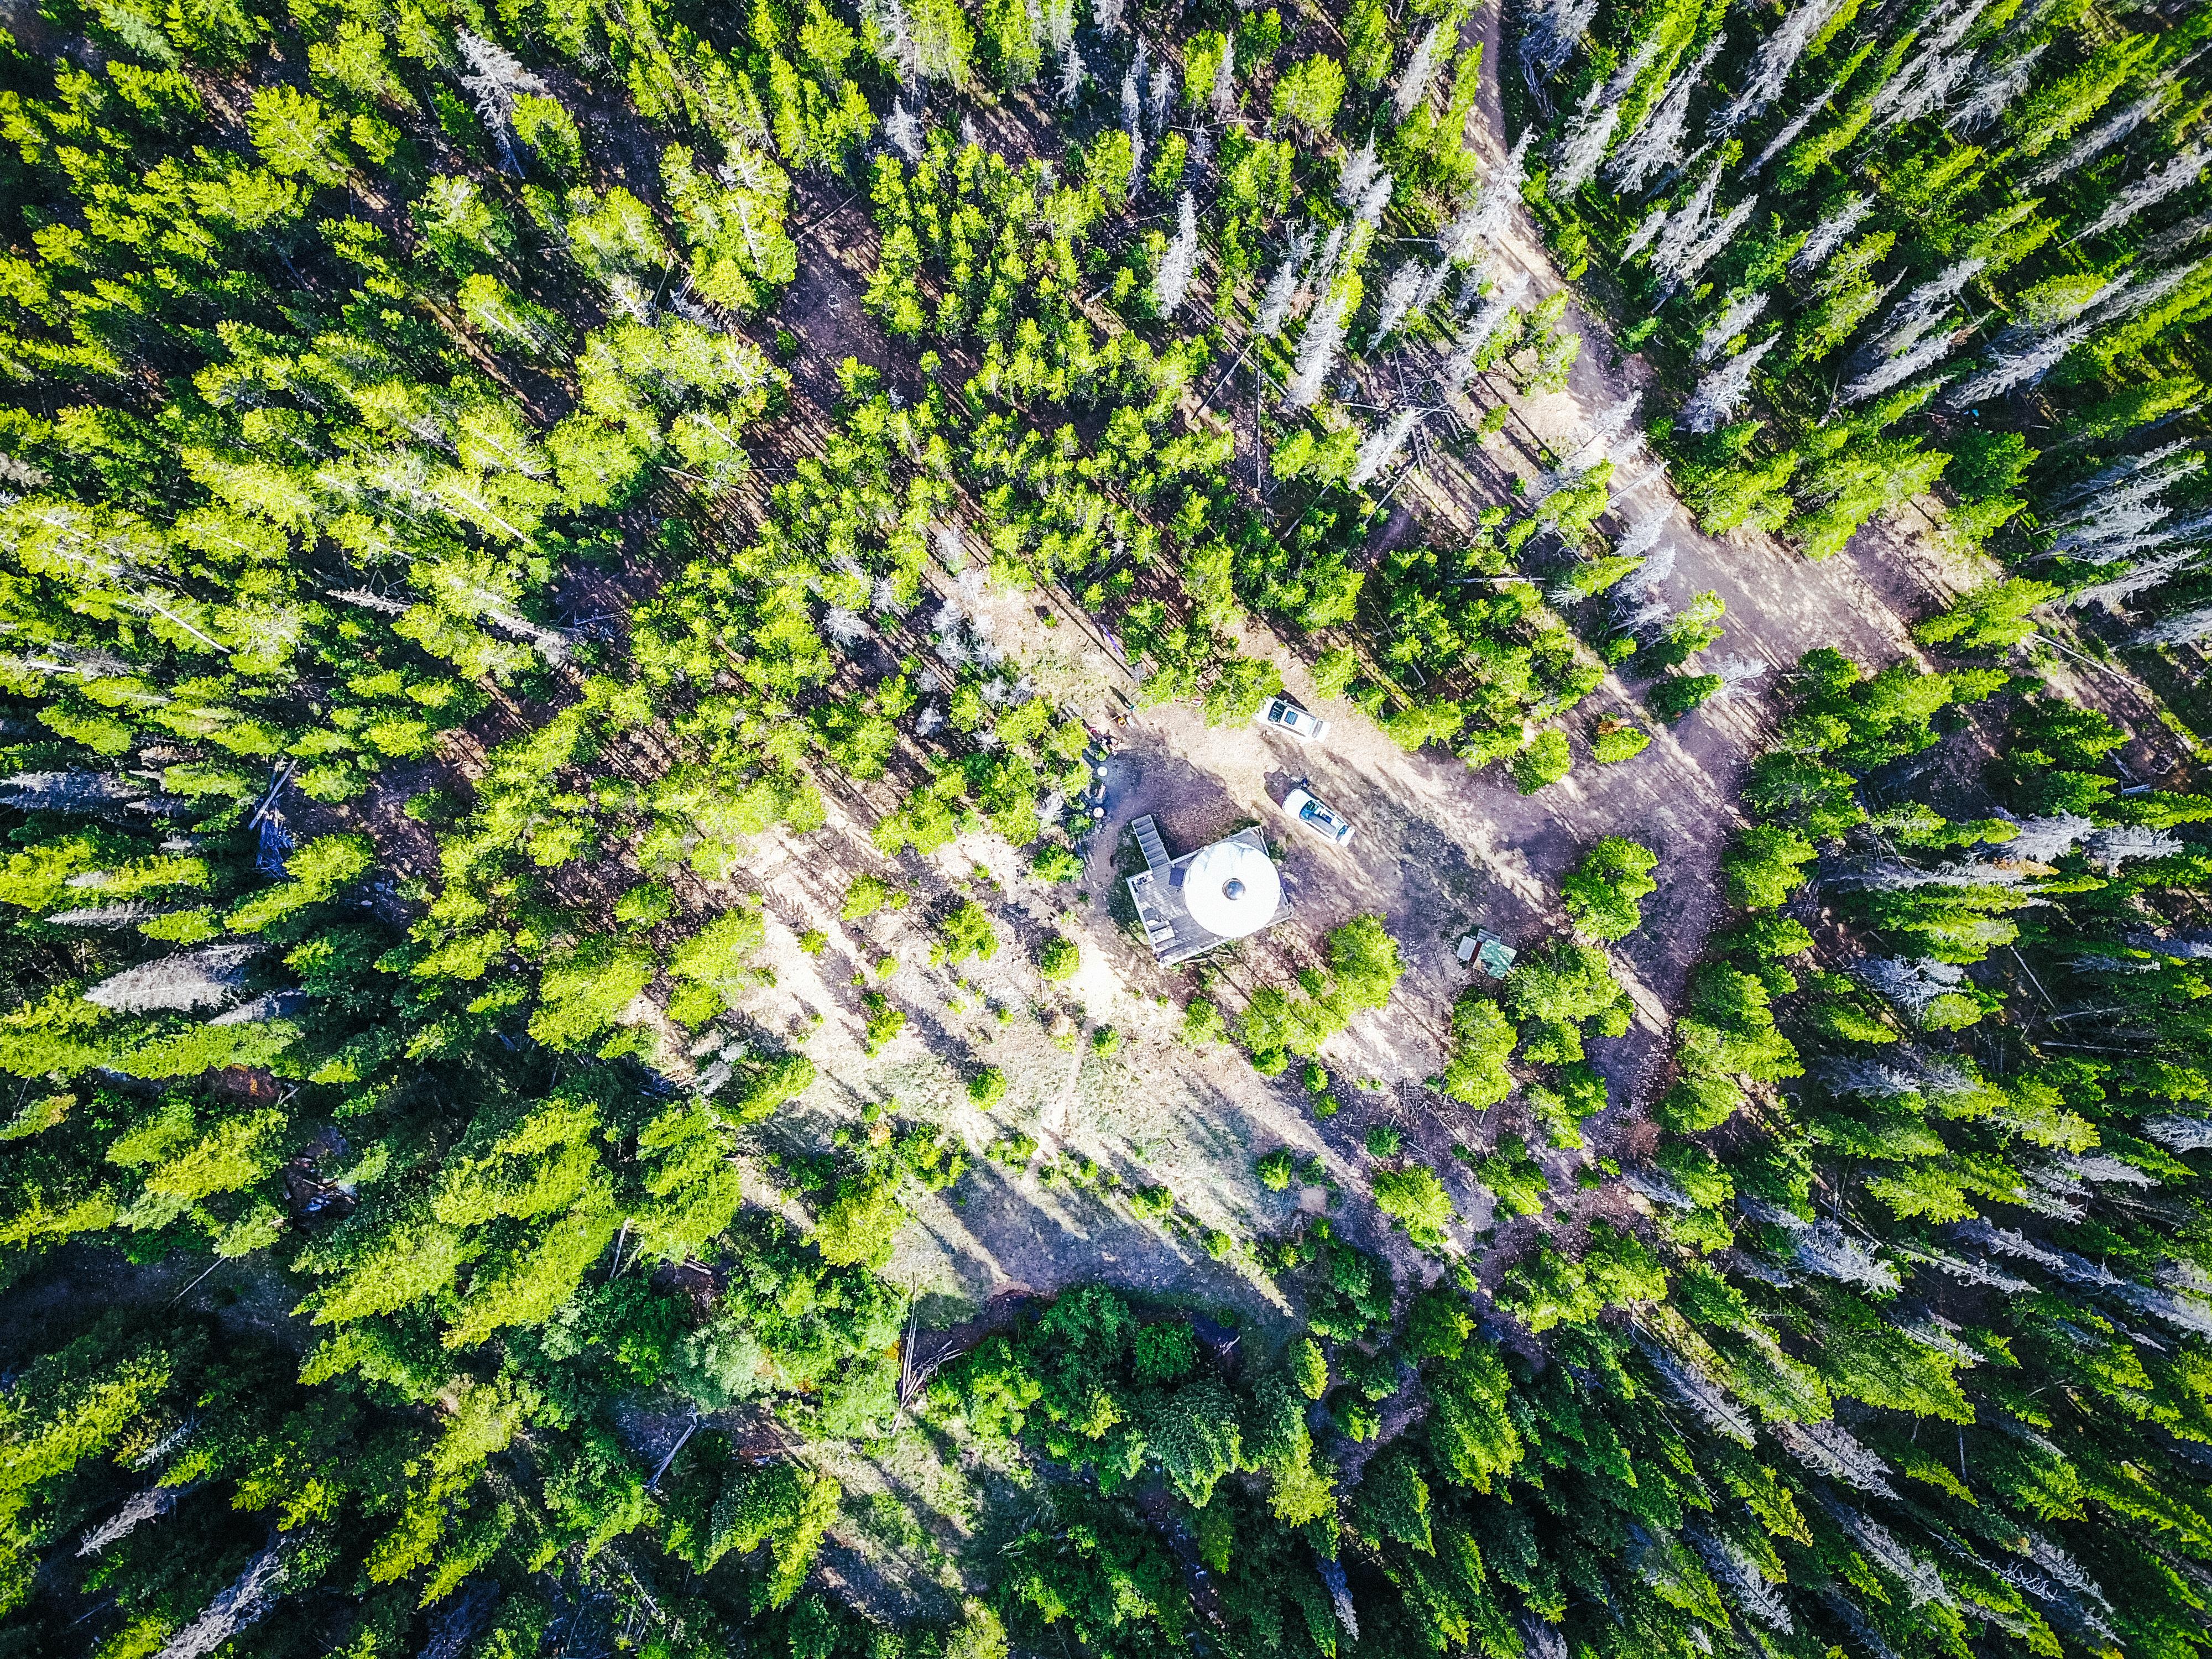 Clark Peak Yurt